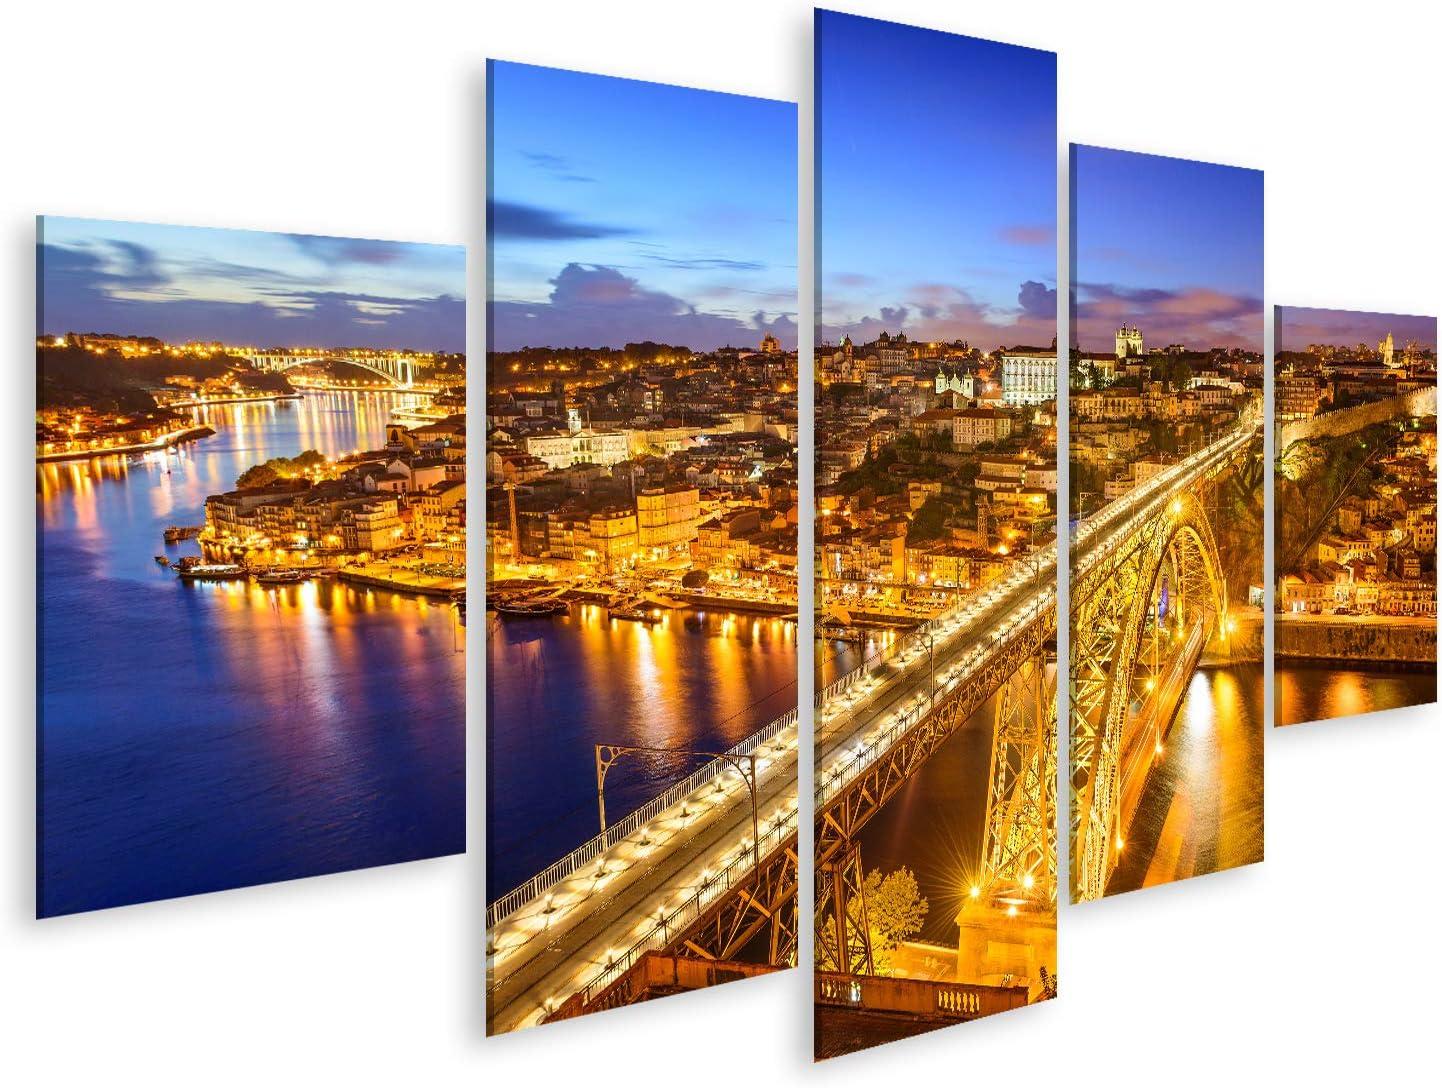 art up your life Bild Bilder auf Leinwand Porto Portugal Stadtbild /über der Dom Luis I Br/ücke Wandbild Poster Leinwandbild TBH